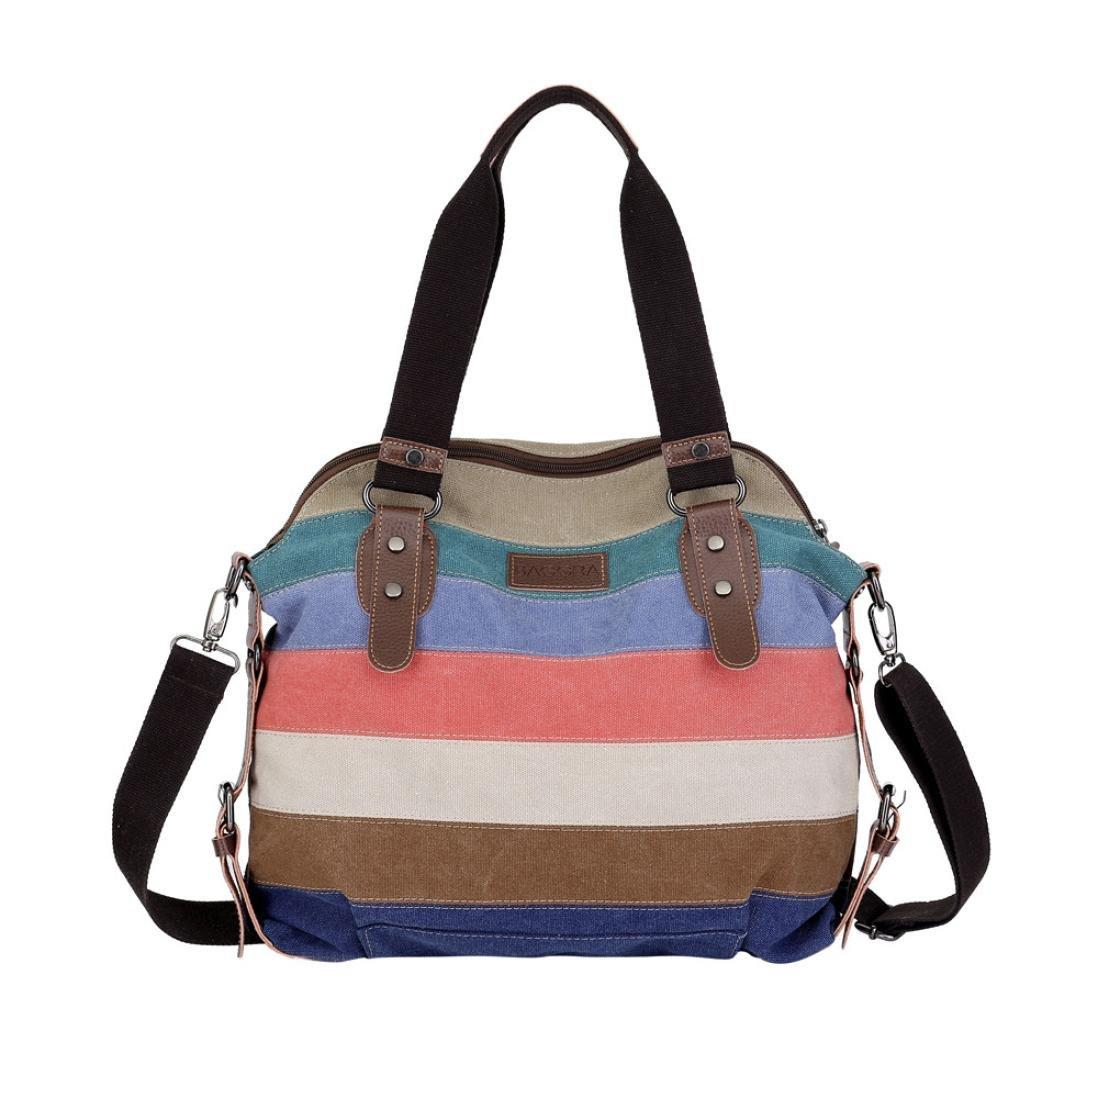 Fashion Canvas Totes Casual Crossbody Shoulder Handbag Outdoor Bag Travel Rucksack For Women Girls (Multicolor)